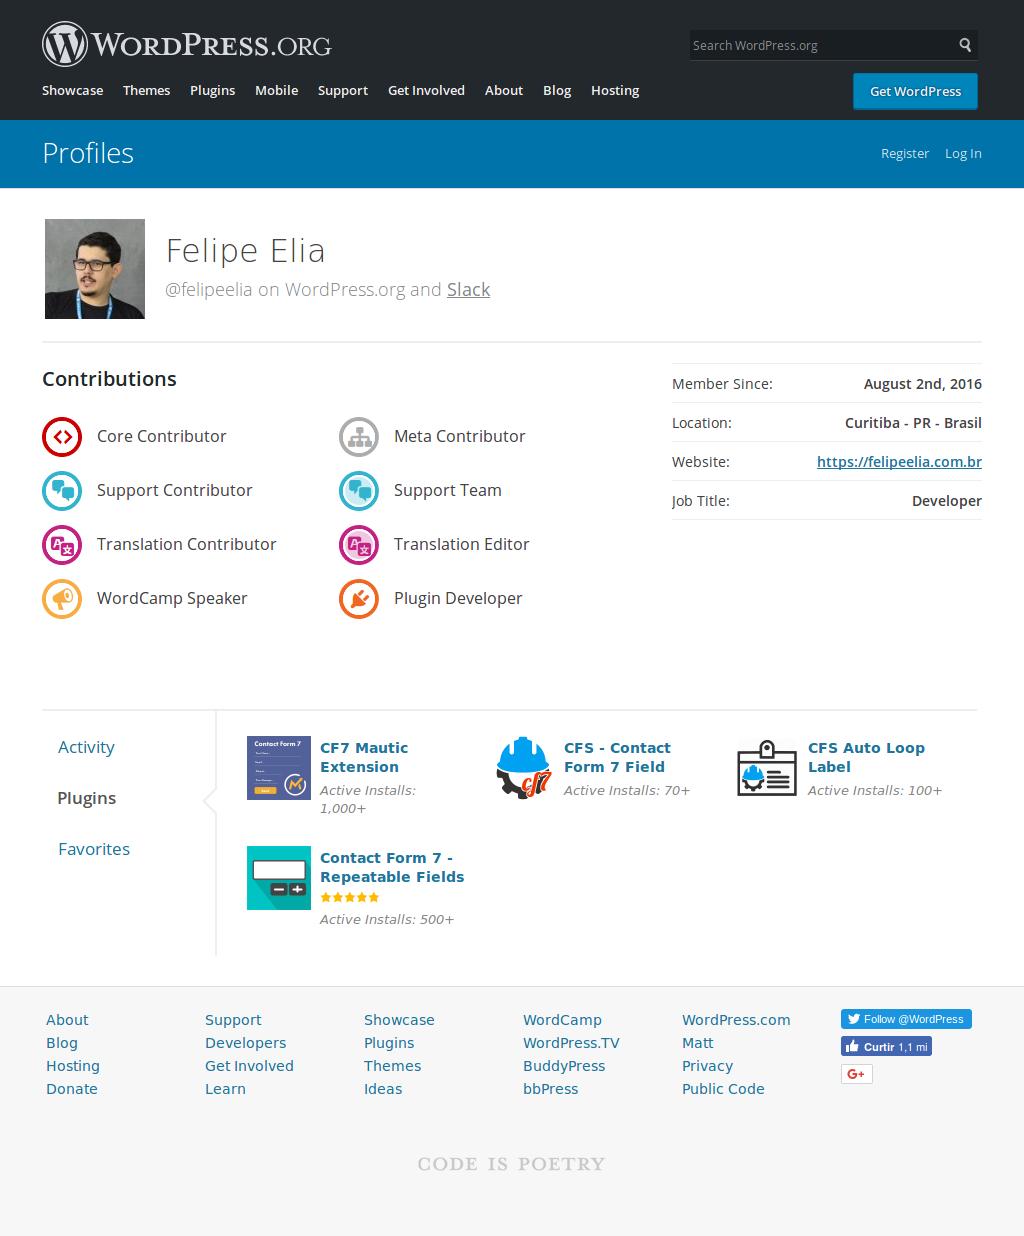 My WordPress.org profile